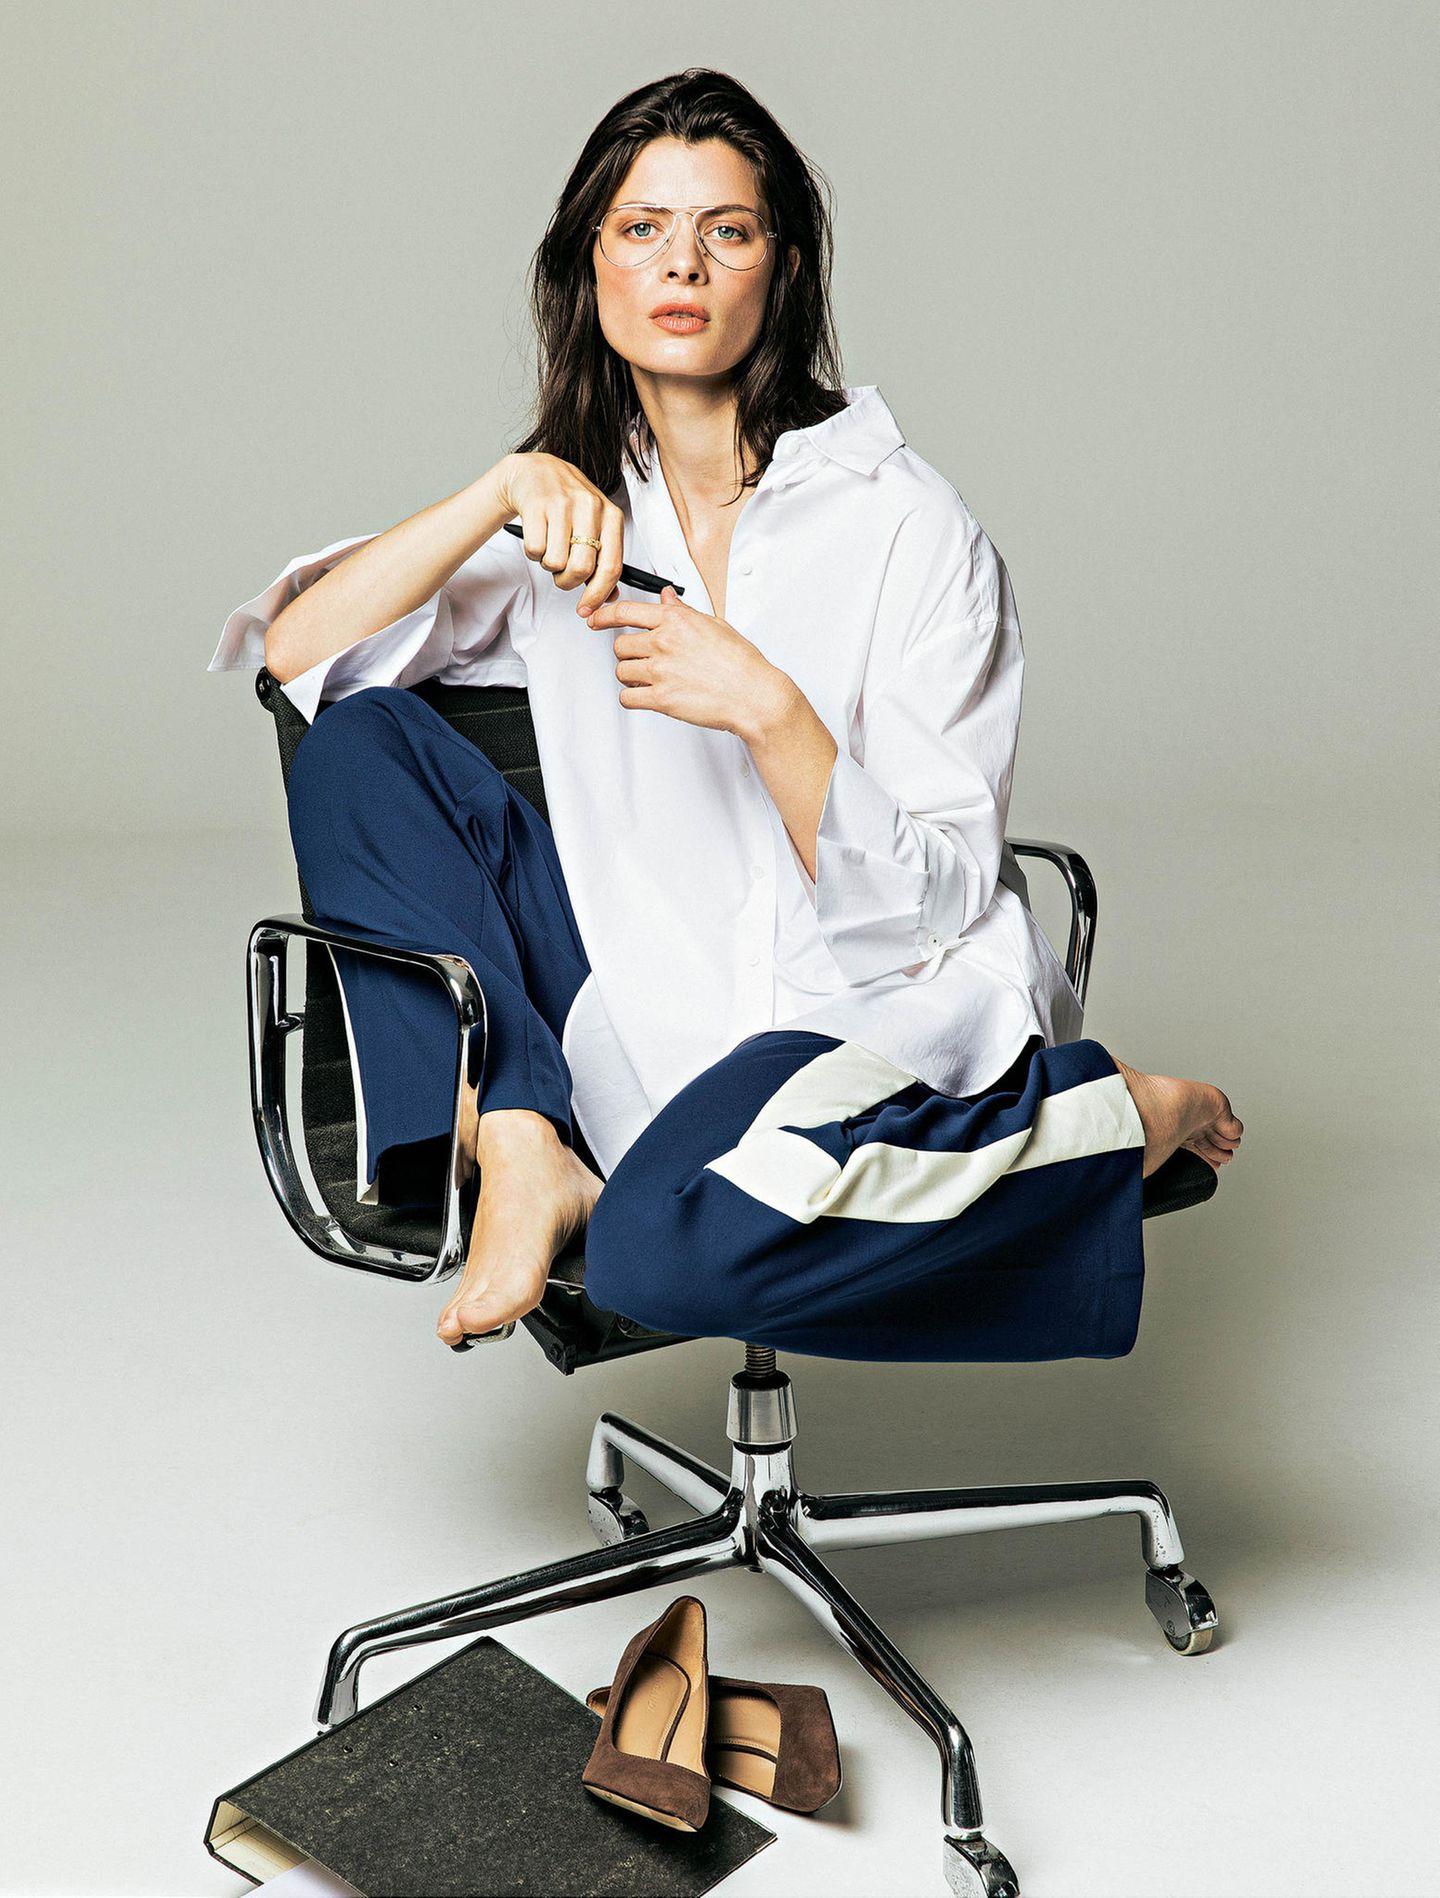 Büro-Looks: Die weiße Bluse